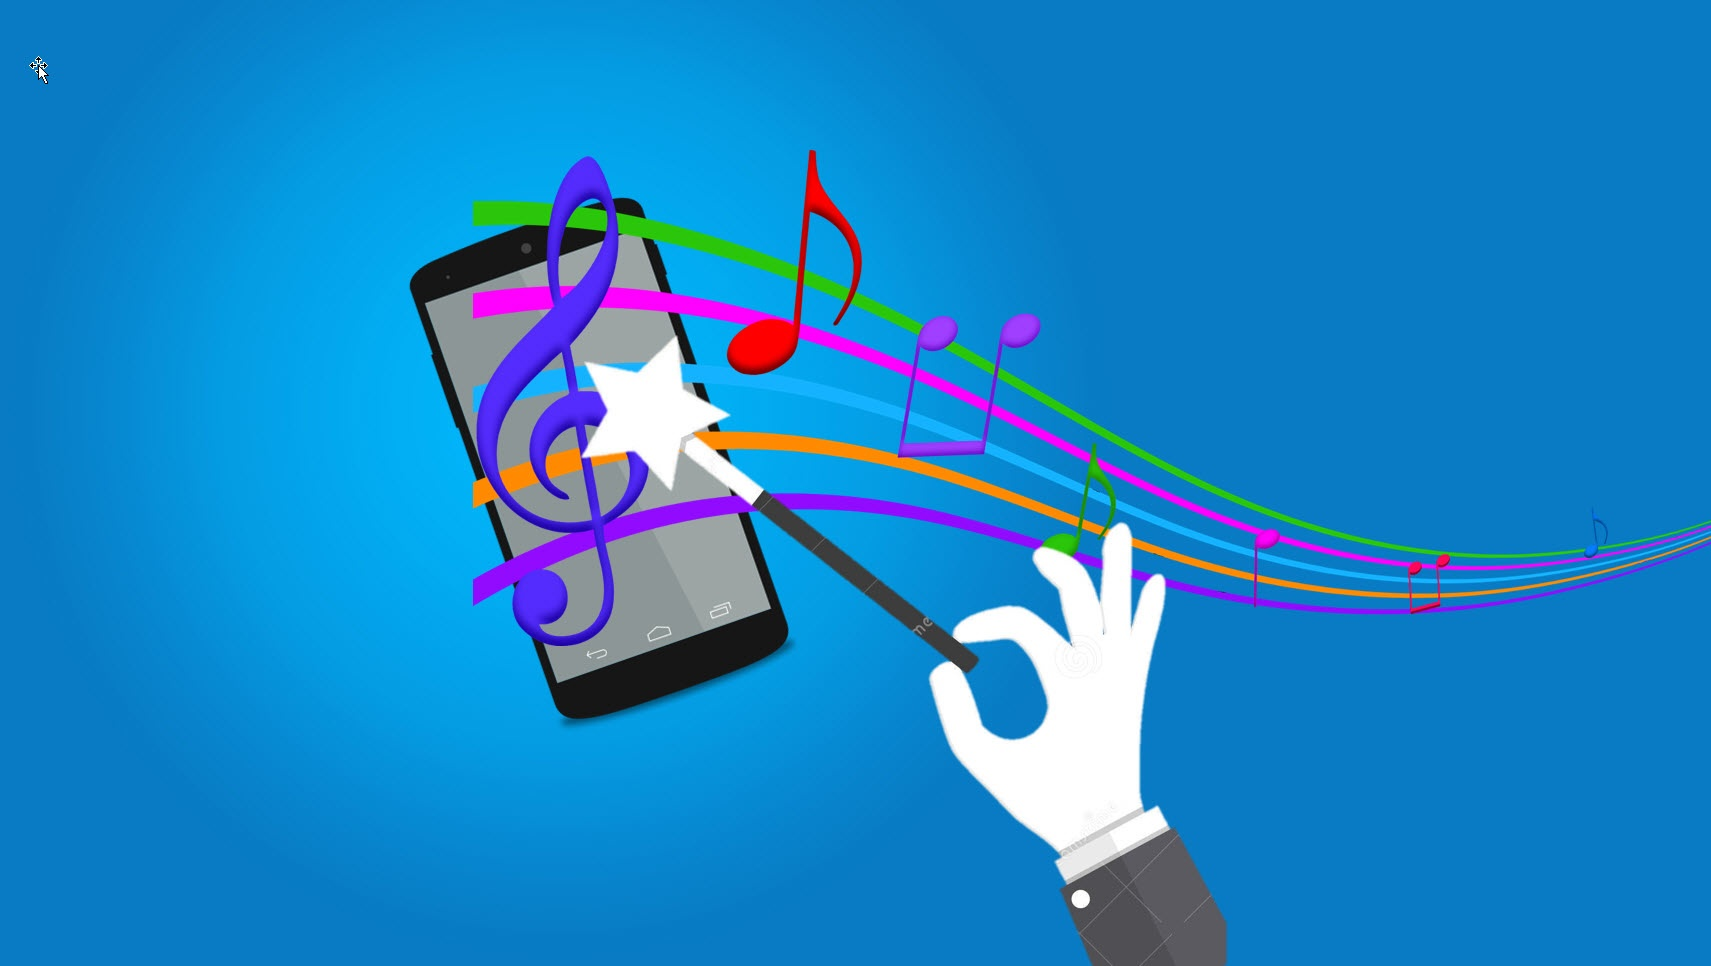 Dab-radio-på-Mobilen-Thumb-2